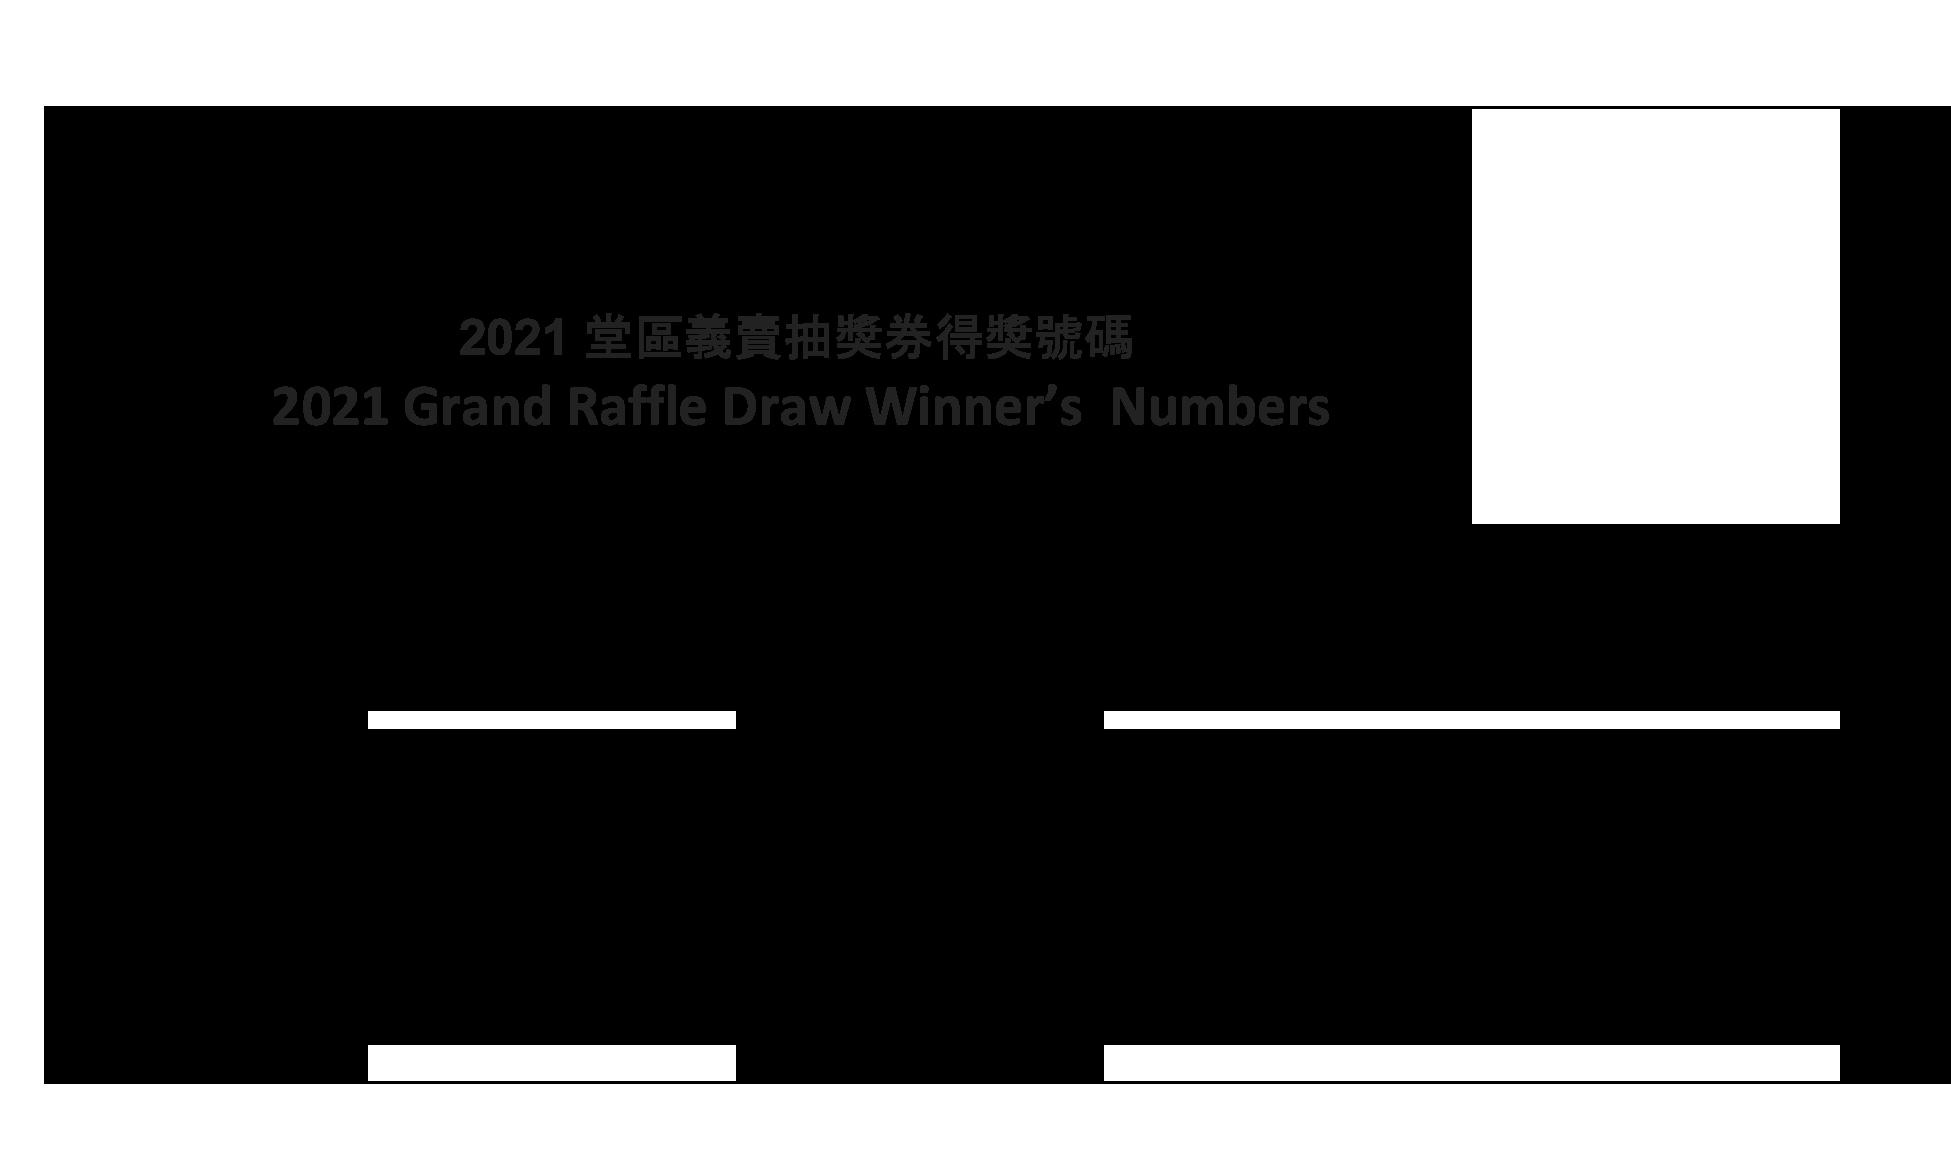 2021 Raffle Draw Winners